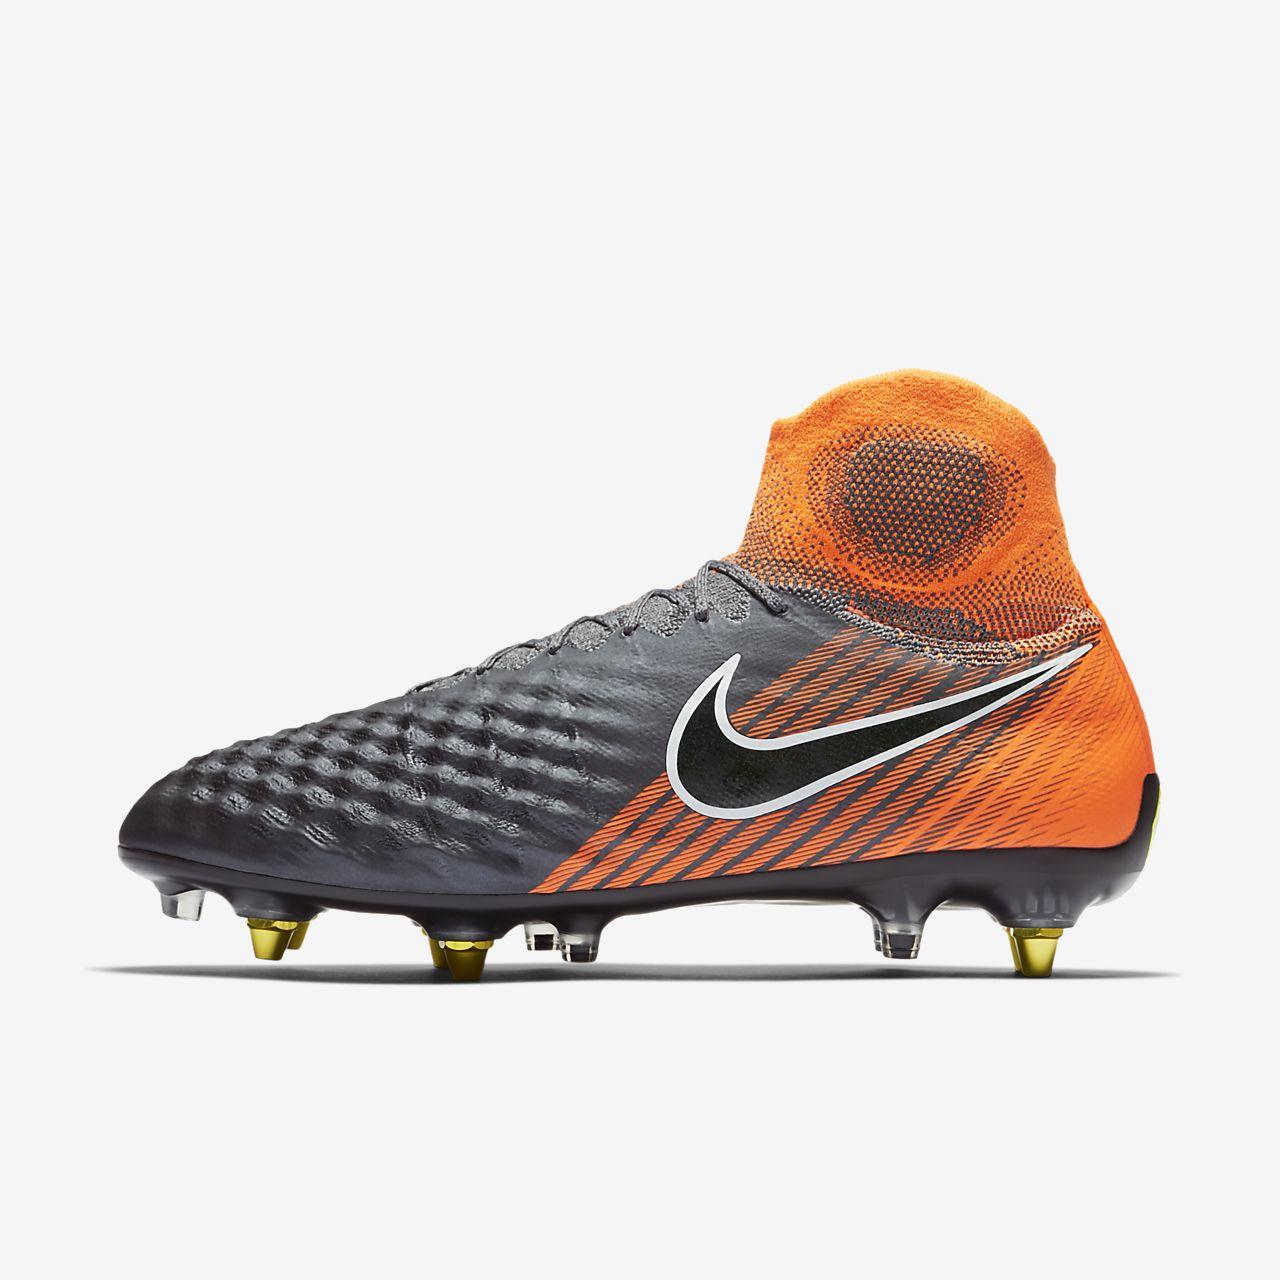 Magista Boot Fit Football II Dynamic SG Soft Elite Ground Nike Obra PRO 4LqcSA5Rj3